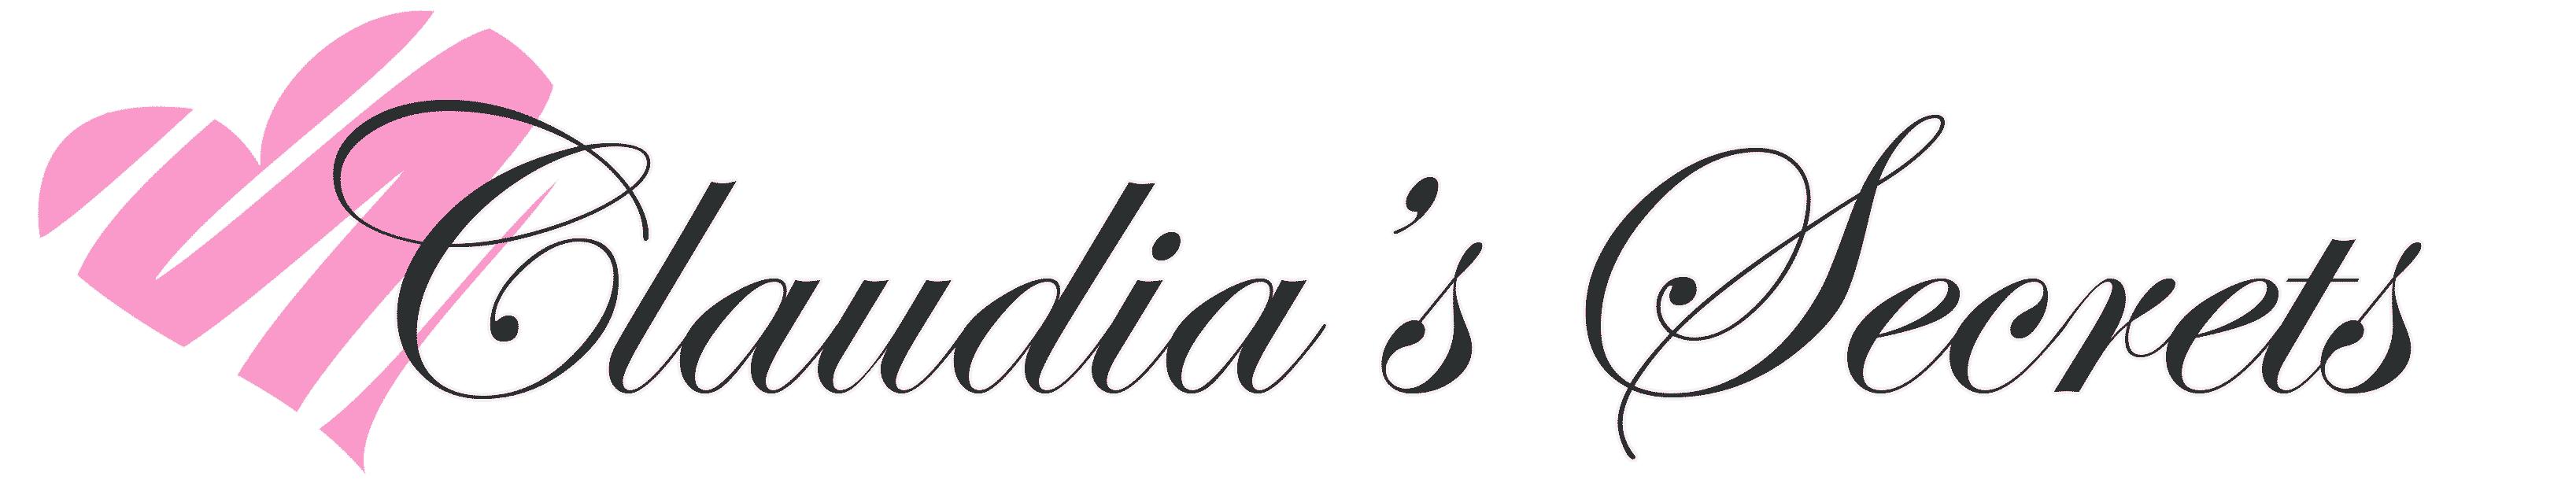 Claudia's Secrets